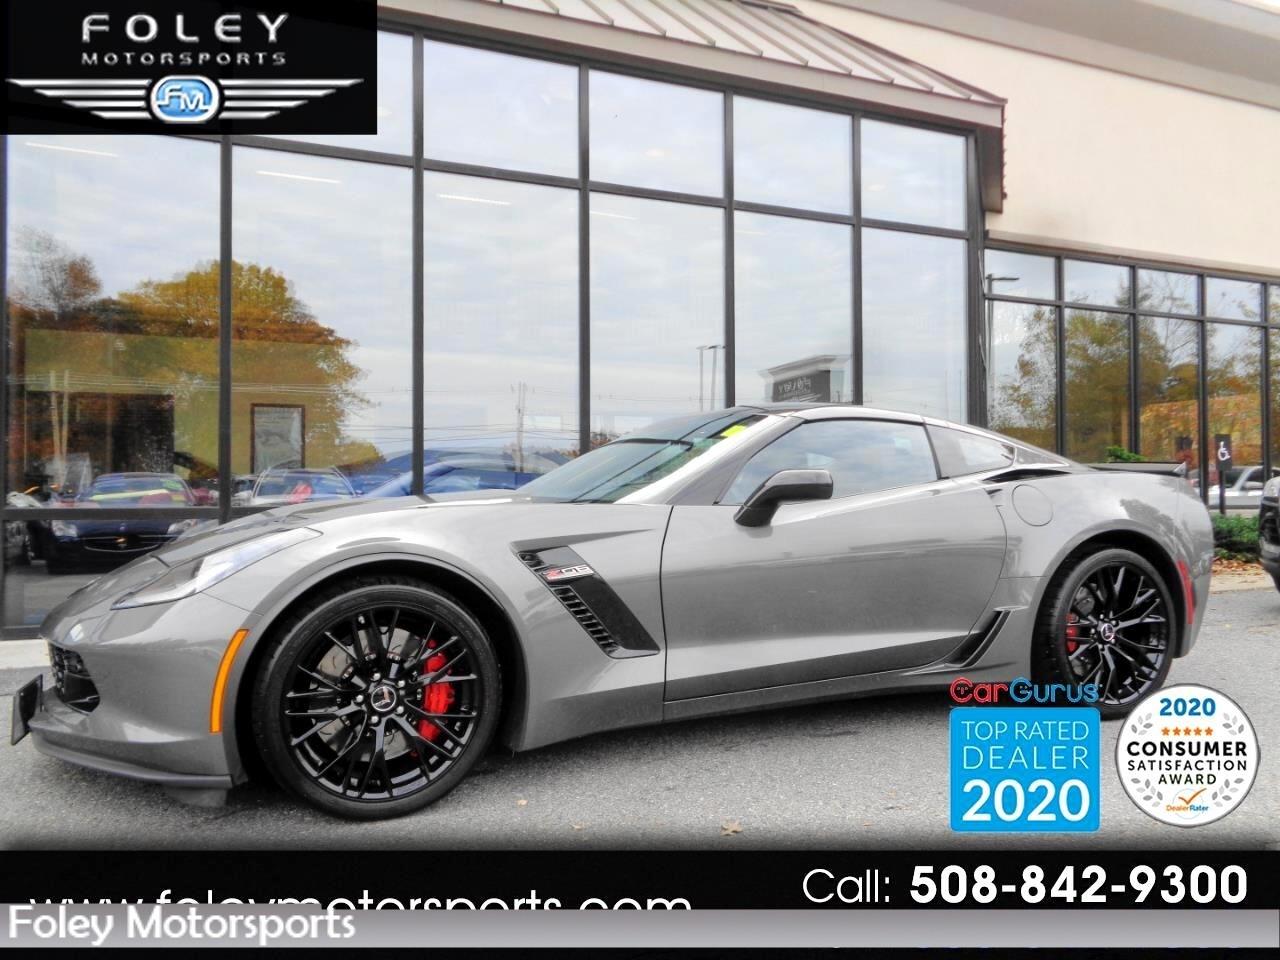 2015 Gray Chevrolet Corvette Z06 3LZ   C7 Corvette Photo 1